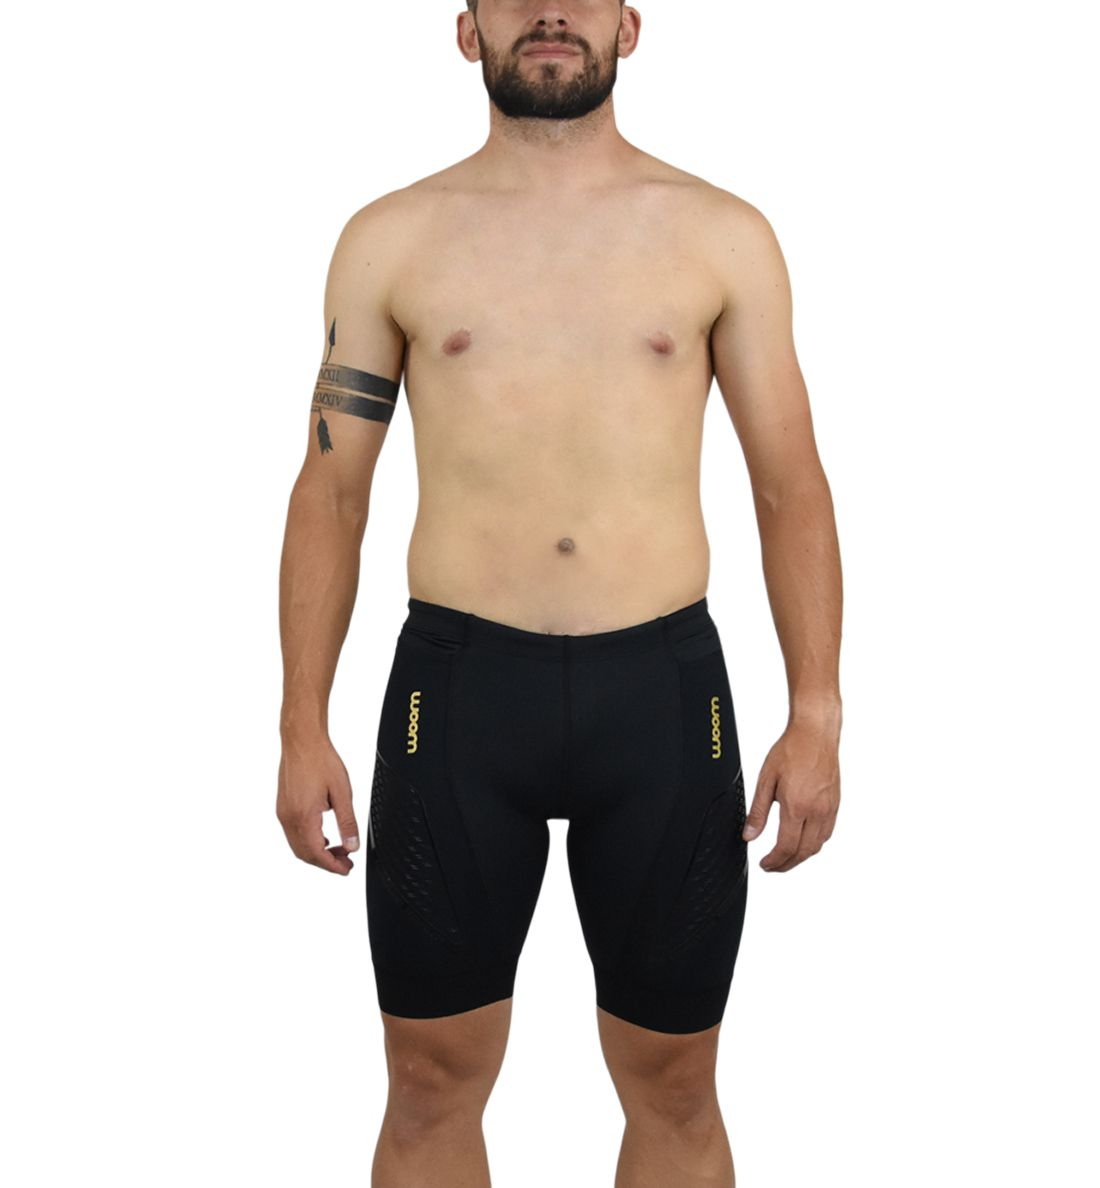 Bermuda Triathlon 140 Carbon - Masc - 2019